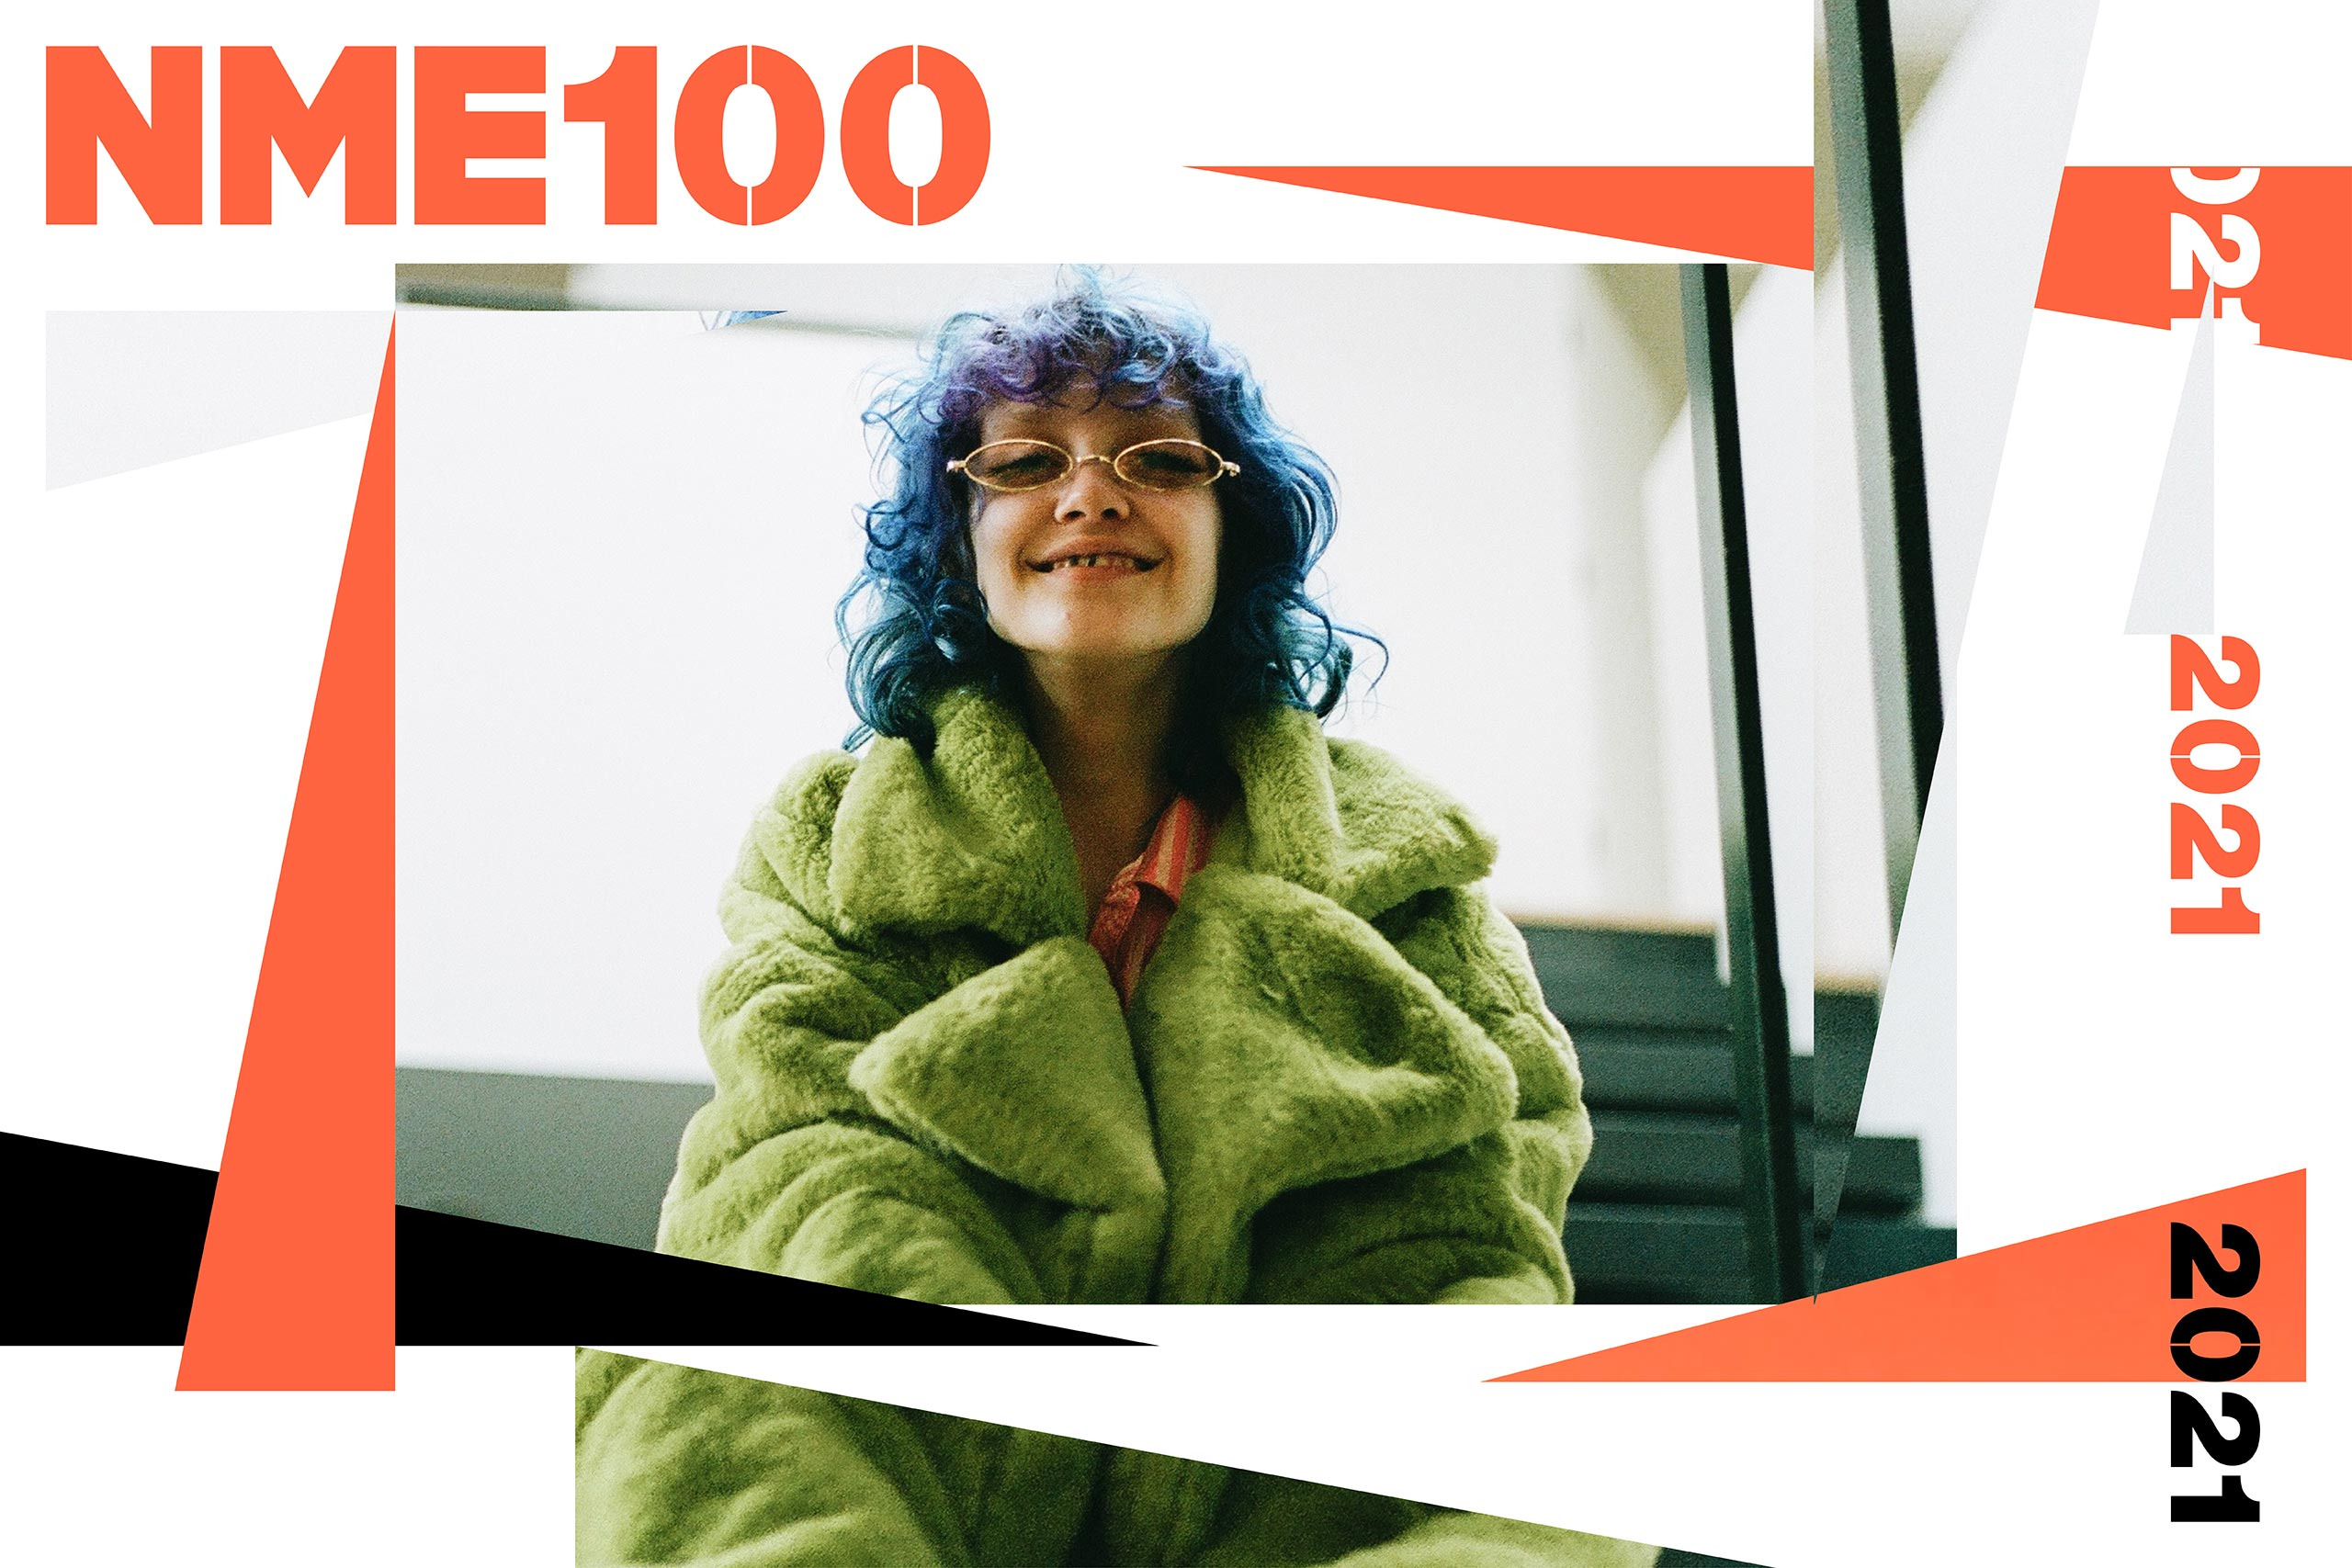 NME 100 chloe moriondo